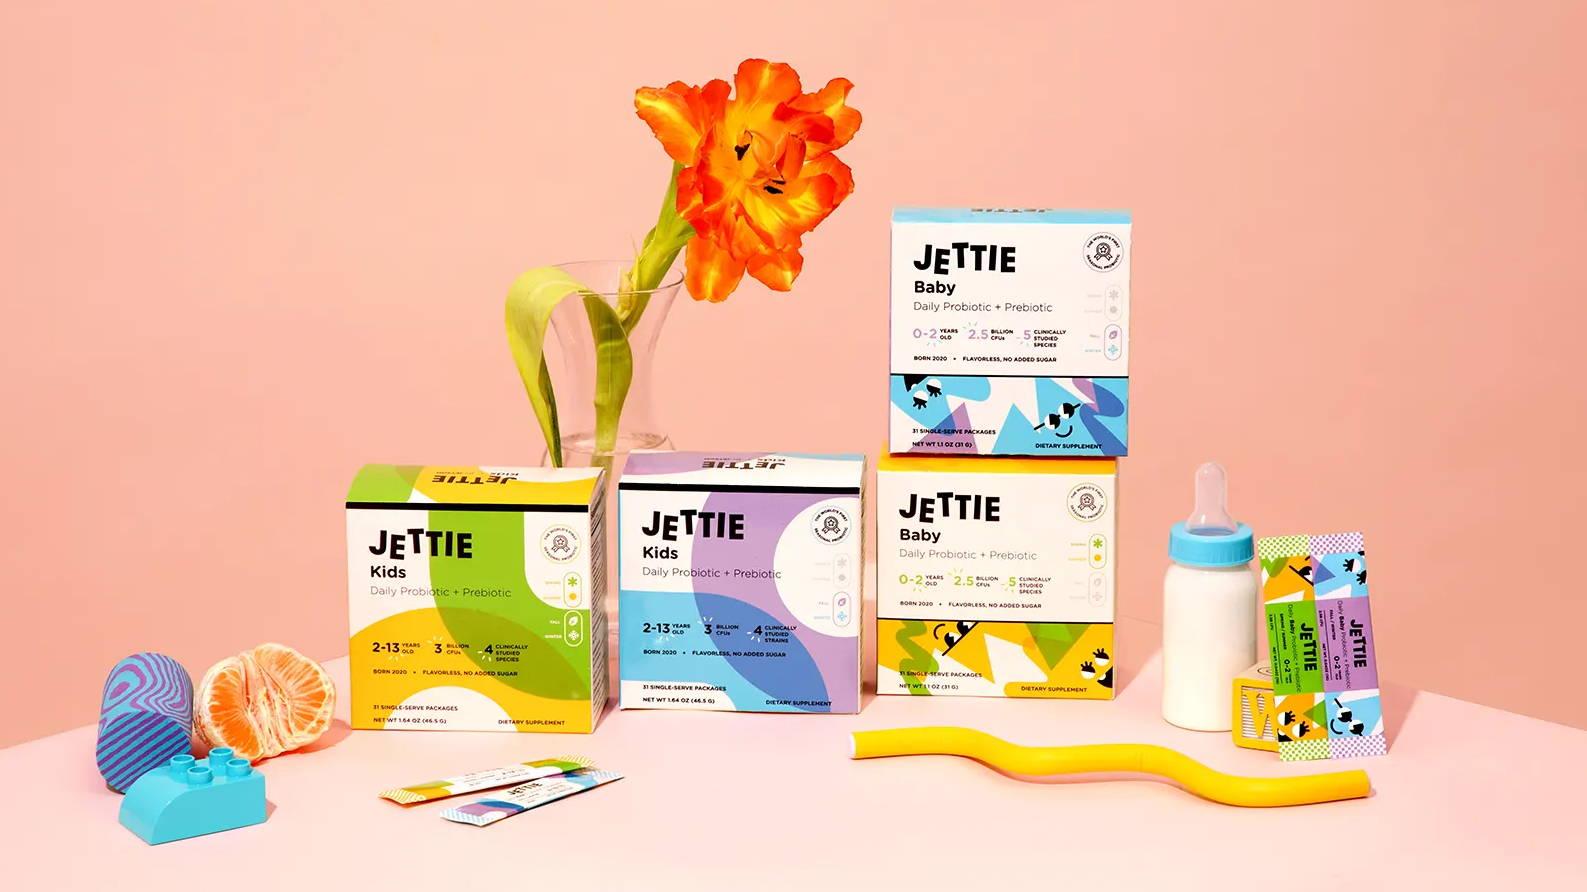 Jettie Probiotics for Kids